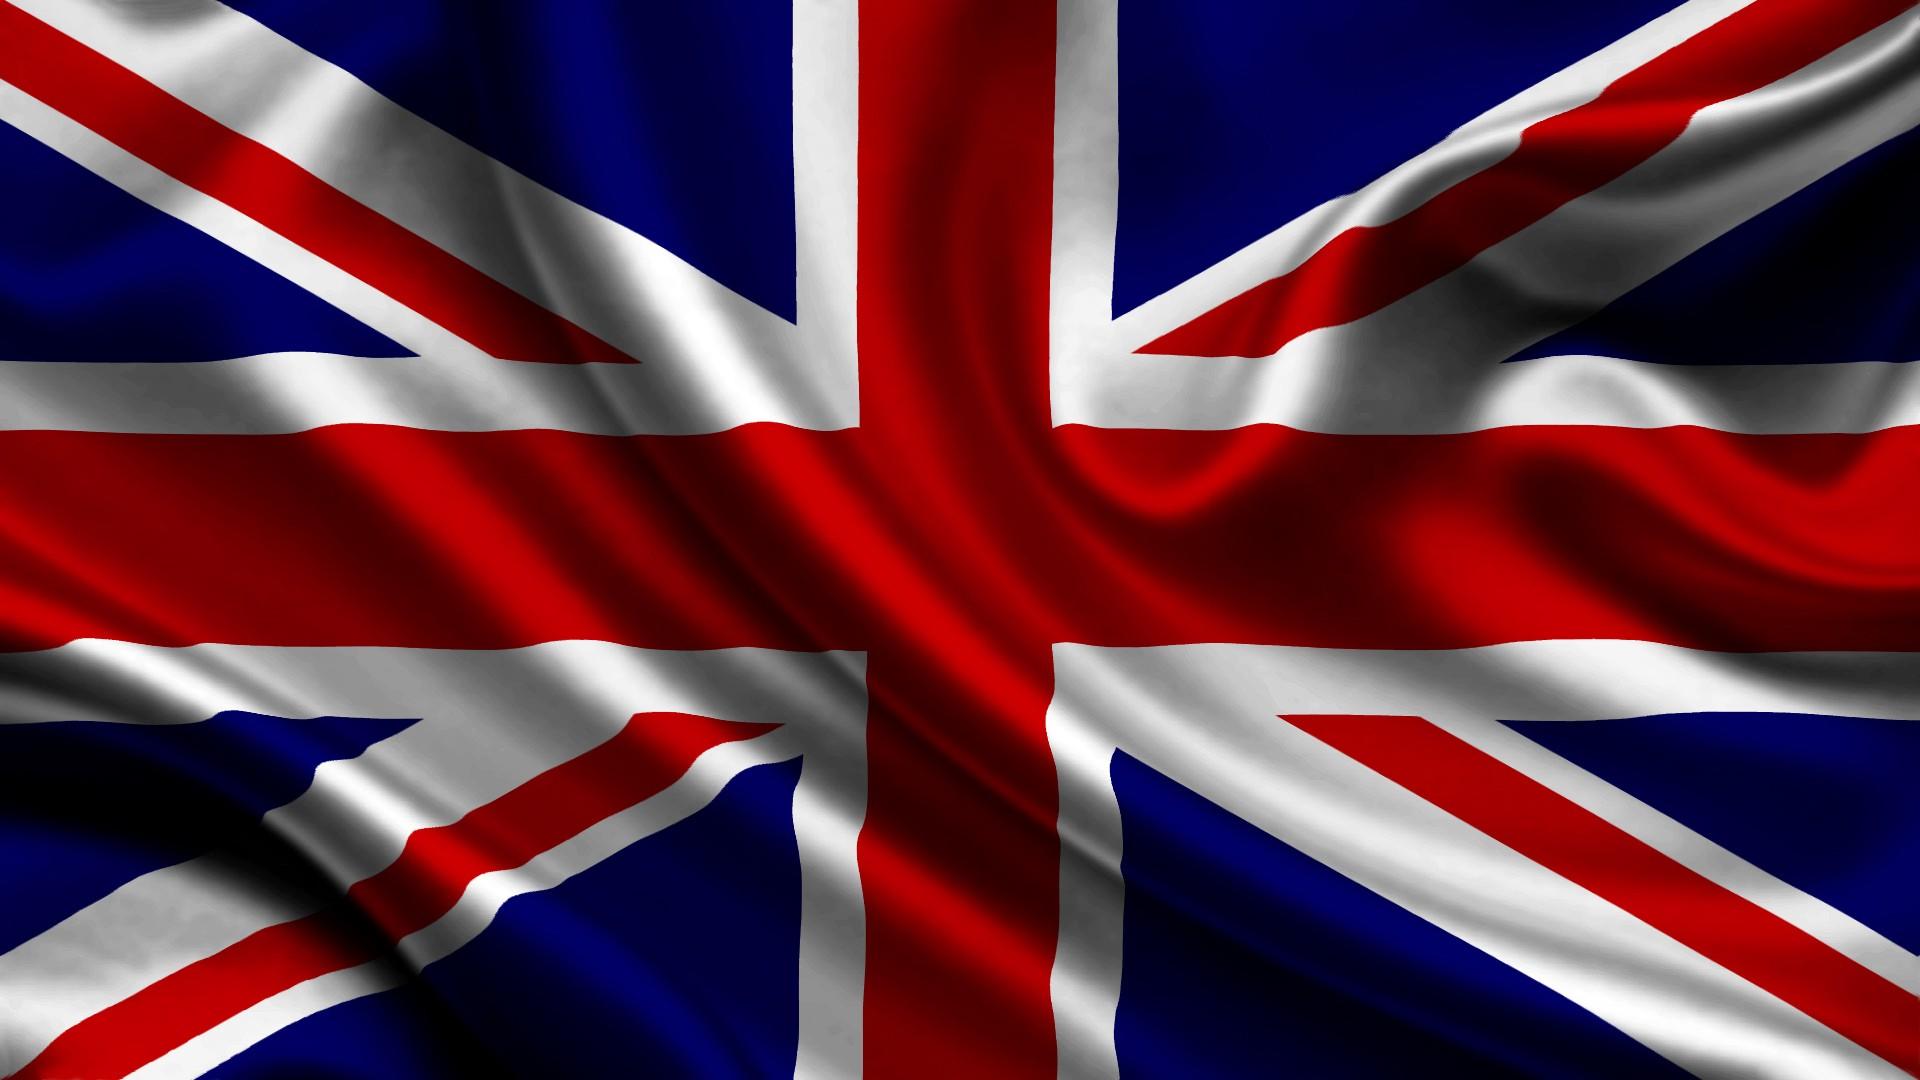 uk england flag desktop wallpapers picture of british flag 1920x1080